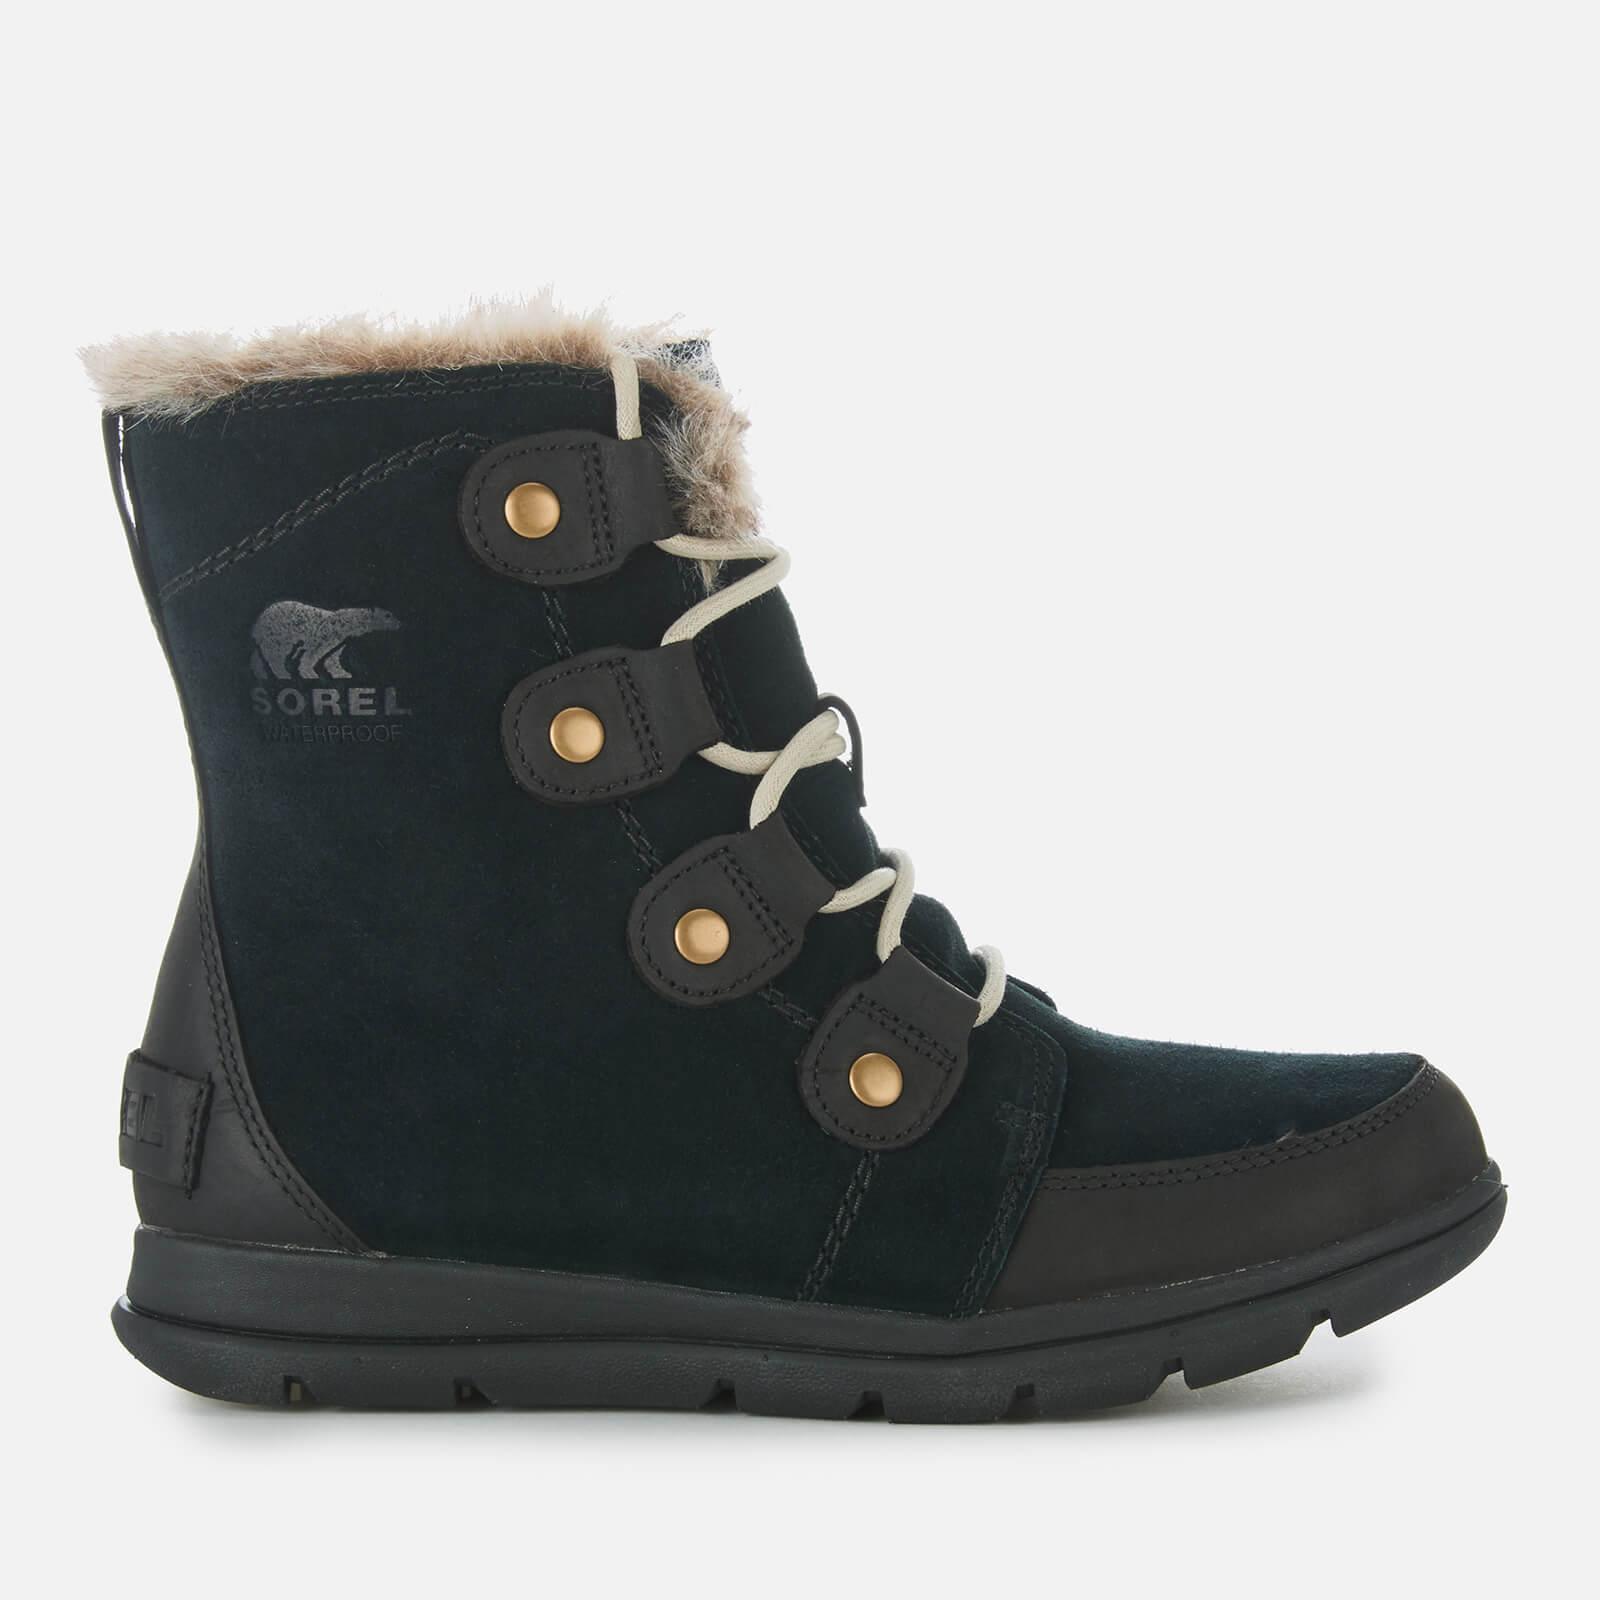 Sorel Women's Explorer Joan Hiker Style Boots - Black Dark Stone - UK 4